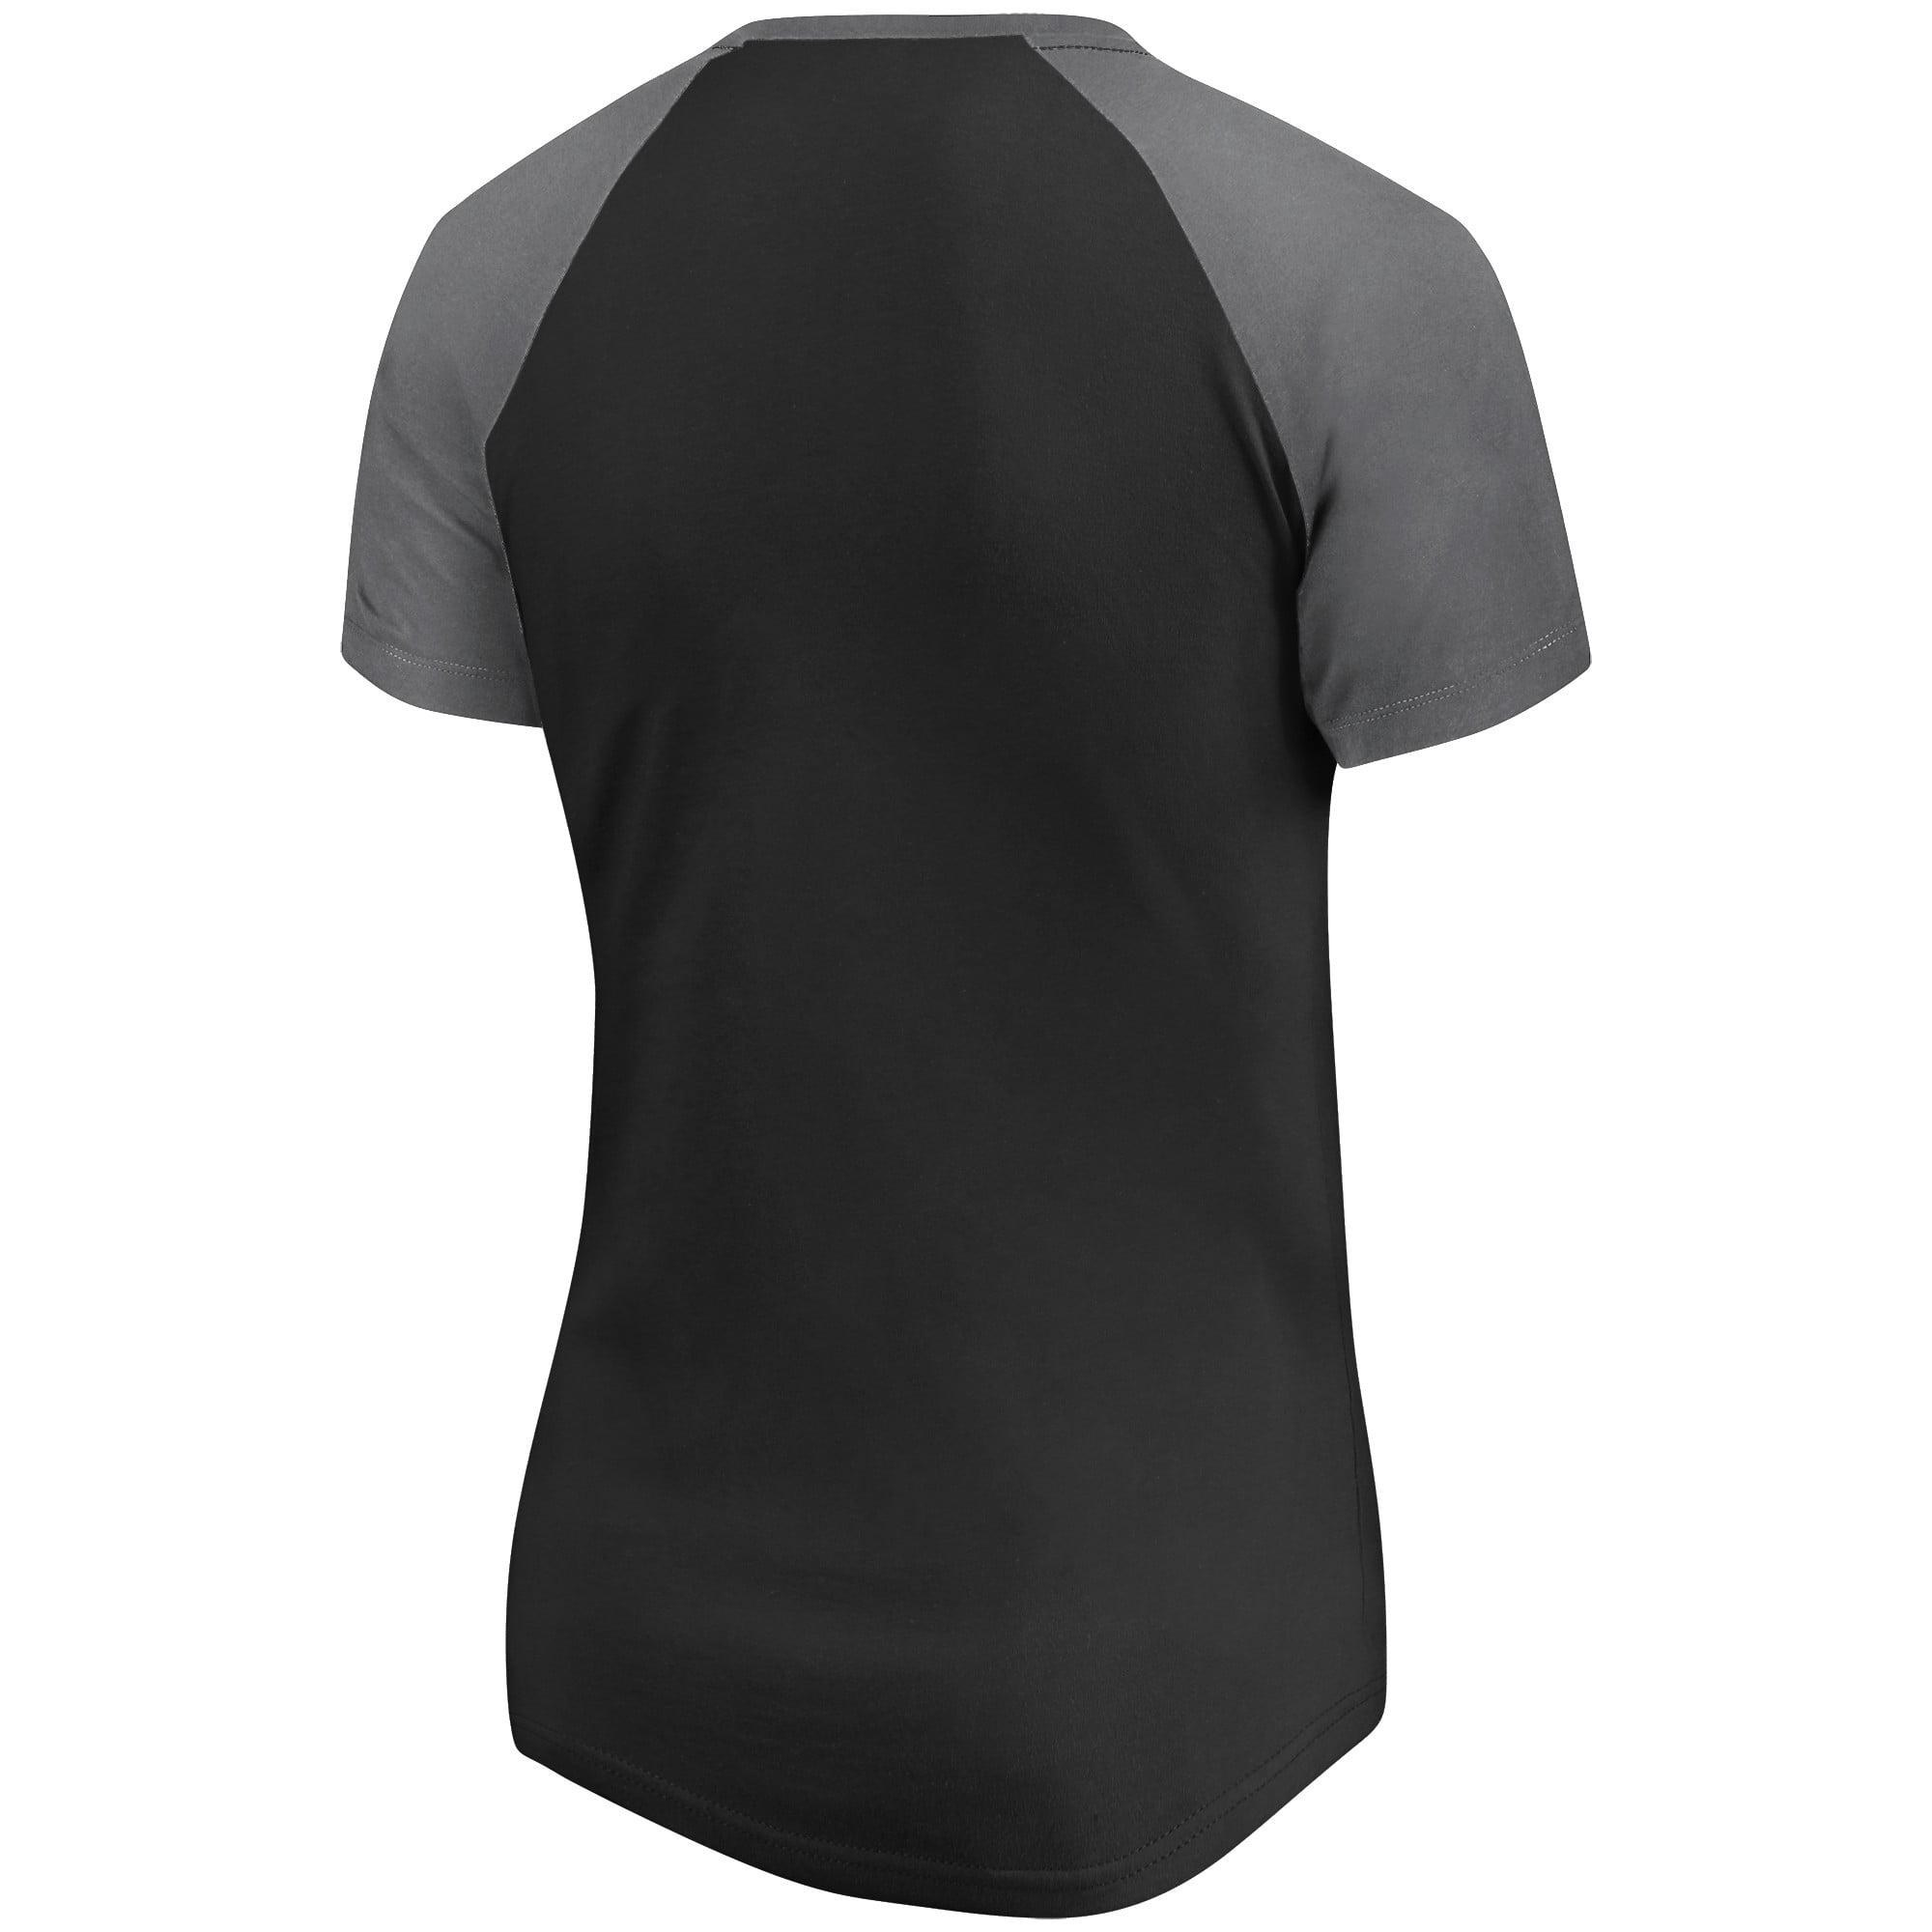 0b578554104 LAFC Fanatics Branded Women s Plus Size Iconic Paid our Dues Raglan V-Neck T -Shirt - Black Gray - Walmart.com